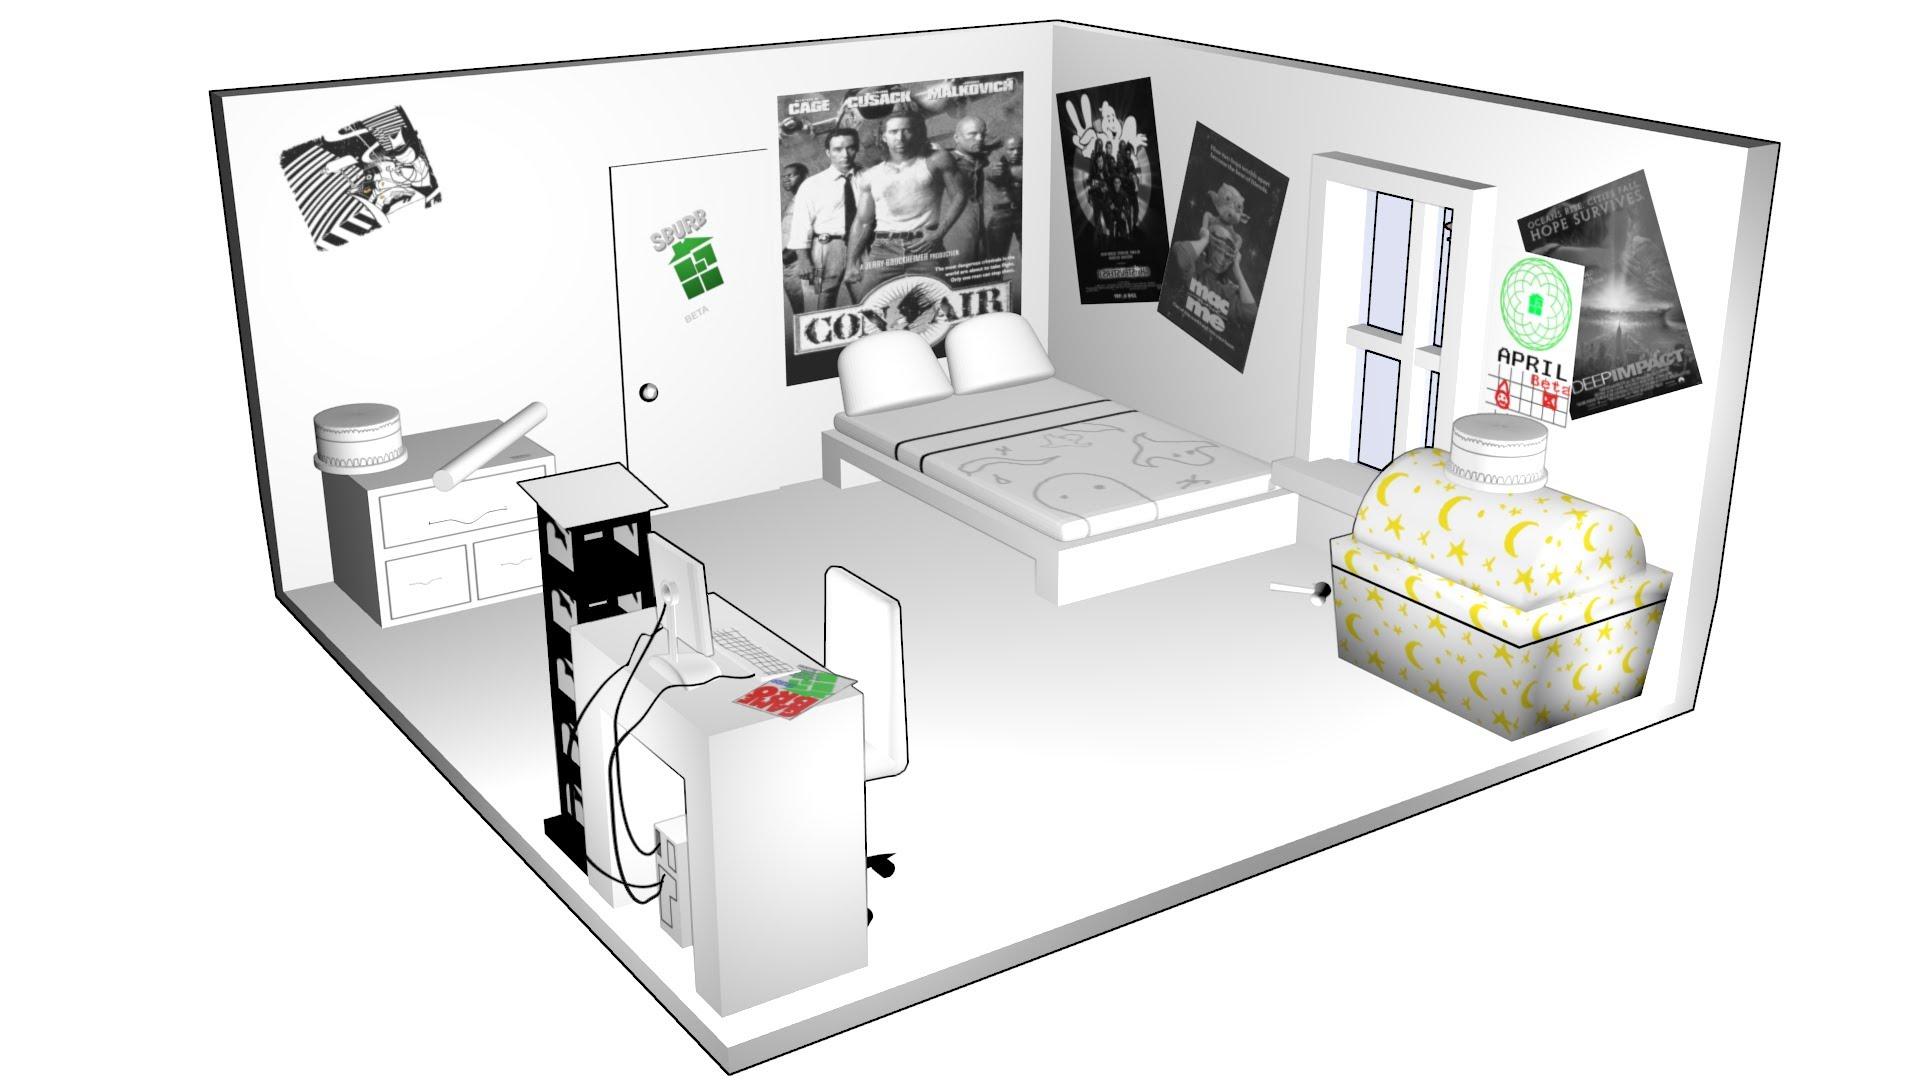 Drawn bedroom homestuck #9